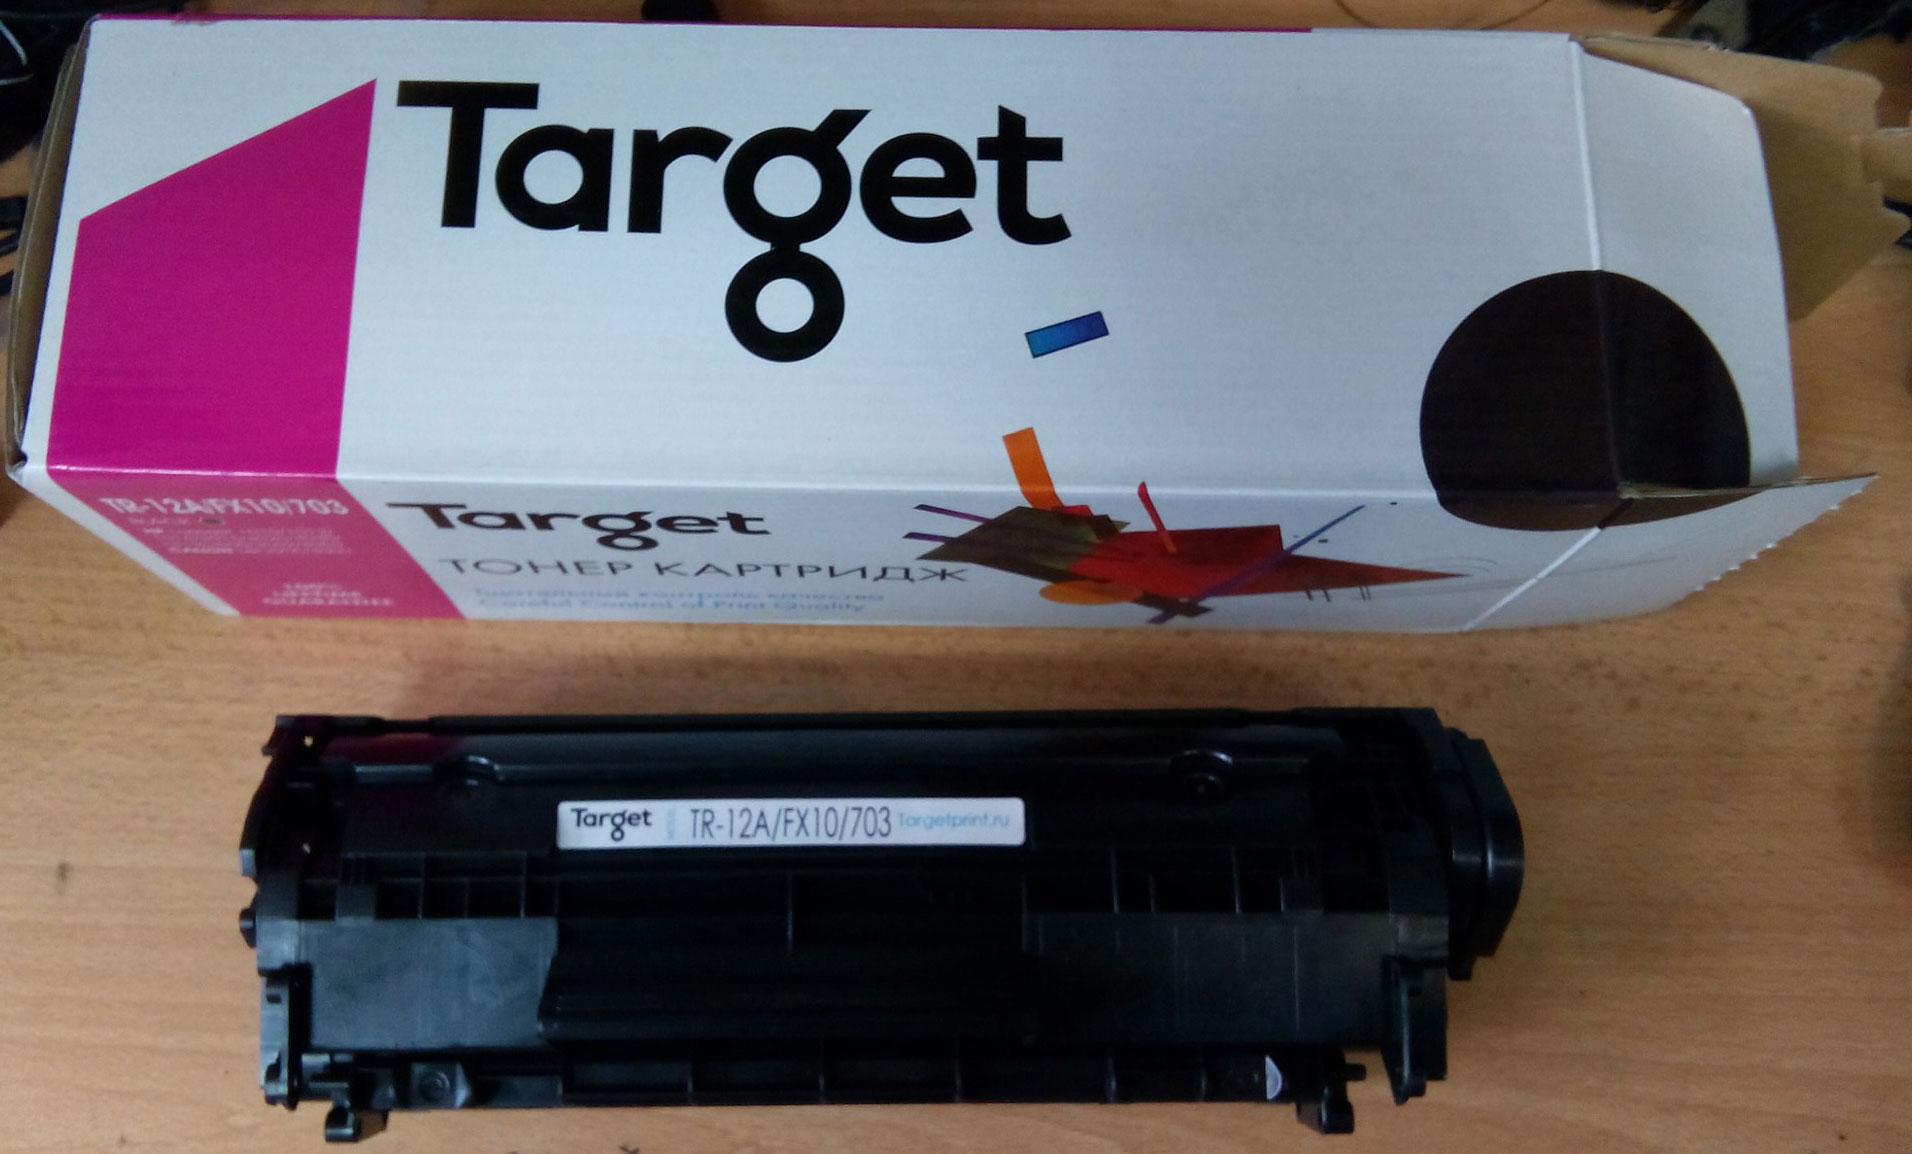 Тест совместимого картриджа Target для HP Q2612A, Canon FX 10